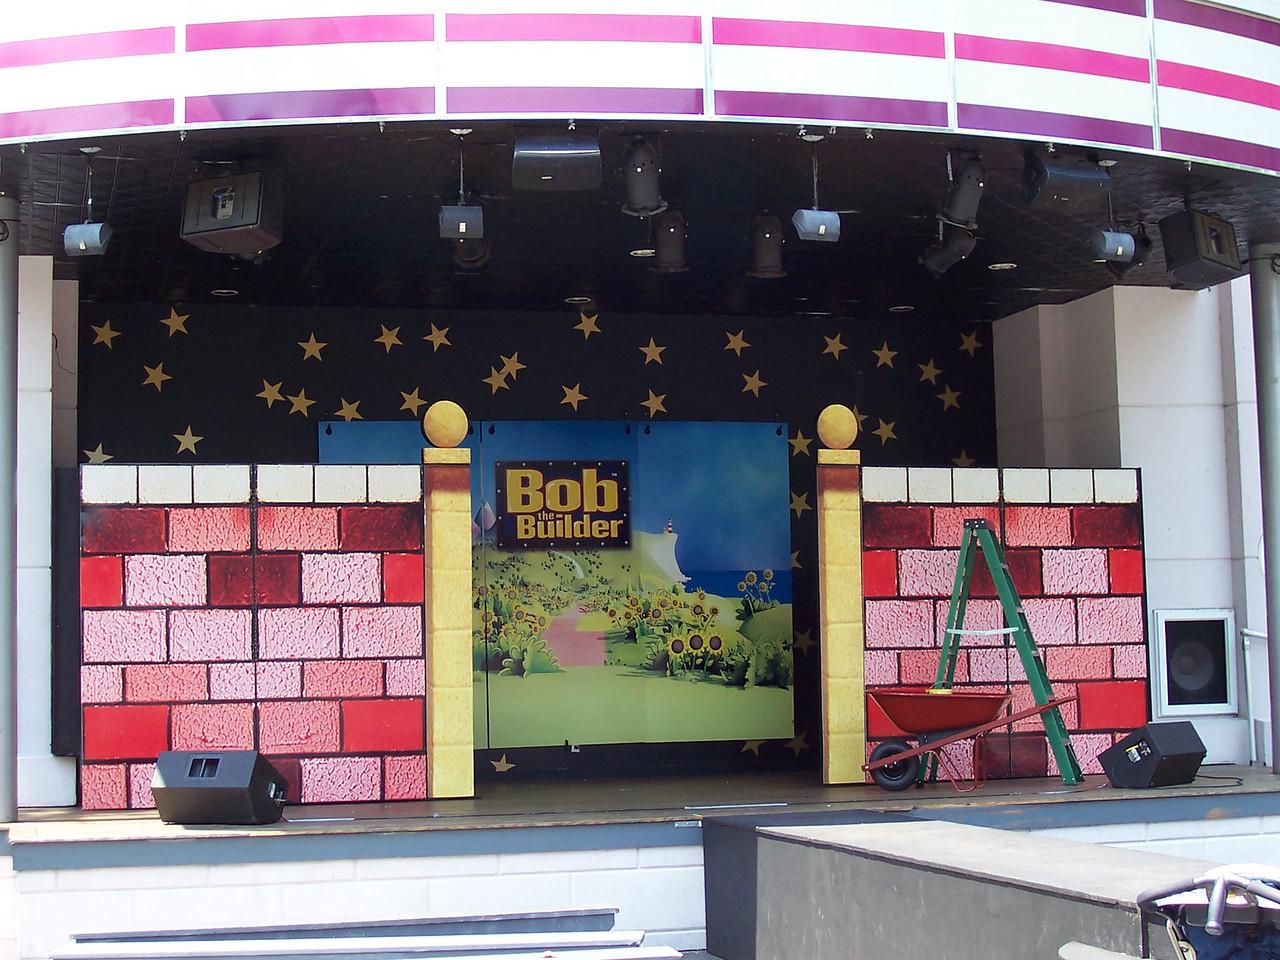 Set for the Bob the Builder show.